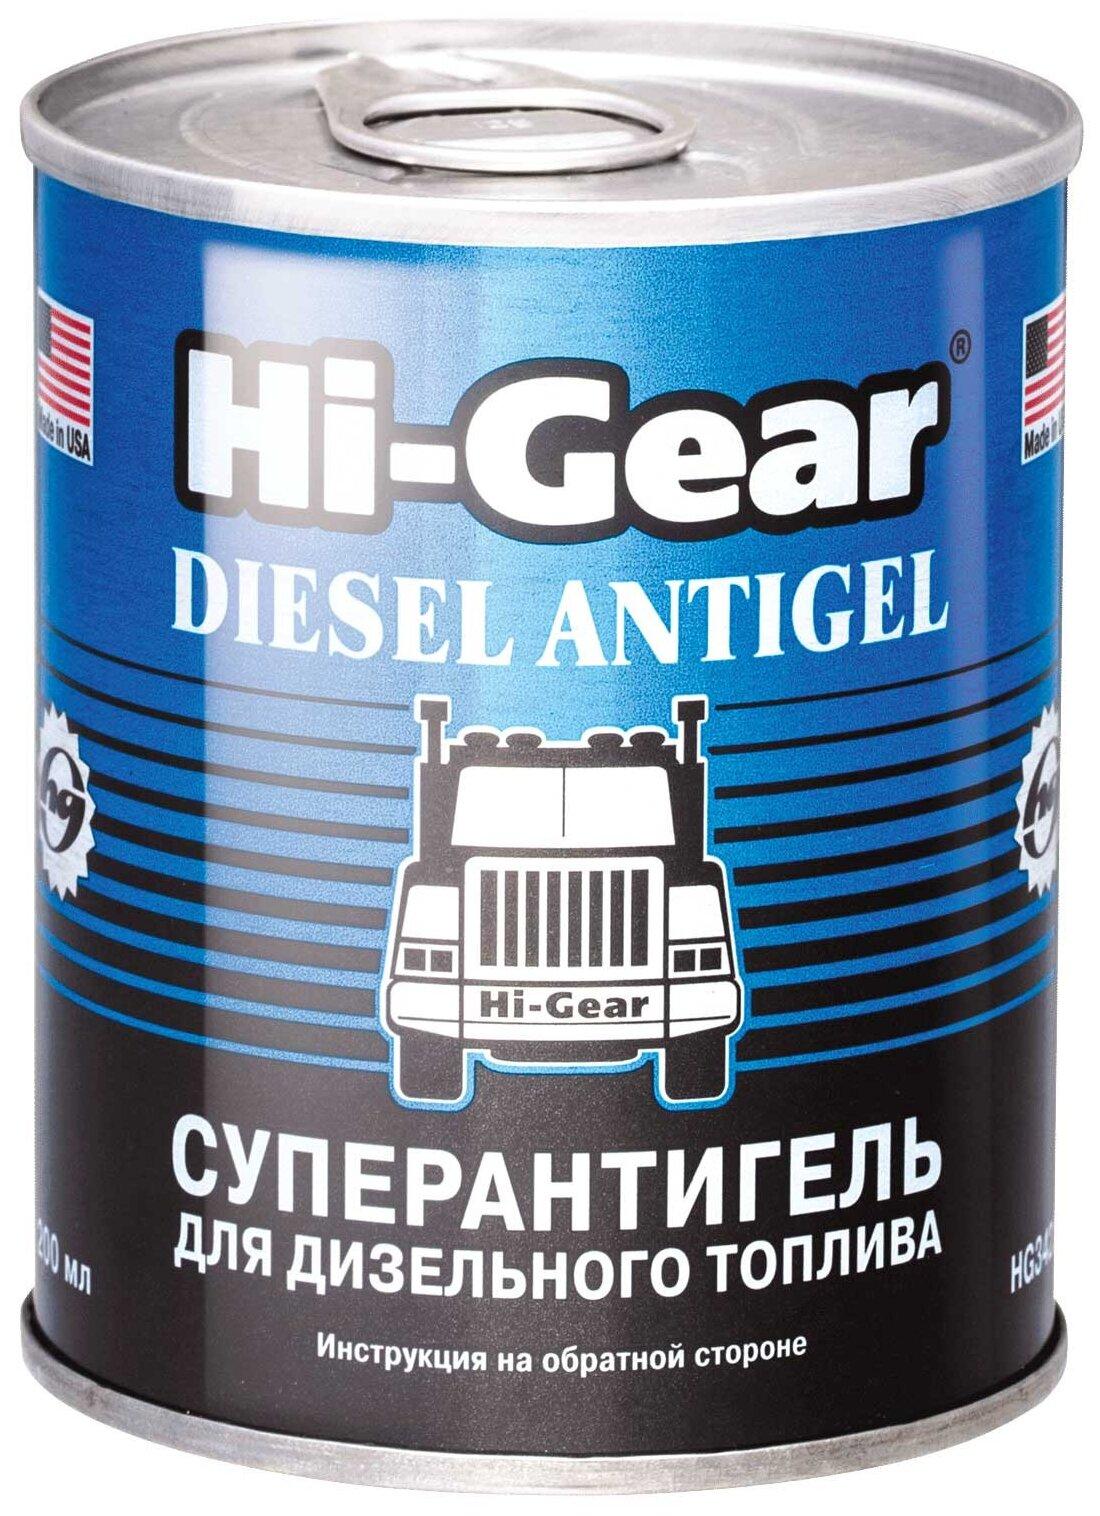 Hi Gear Superantigel Dlya Dizelnogo Topliva Diesel Antigel 0.2 L